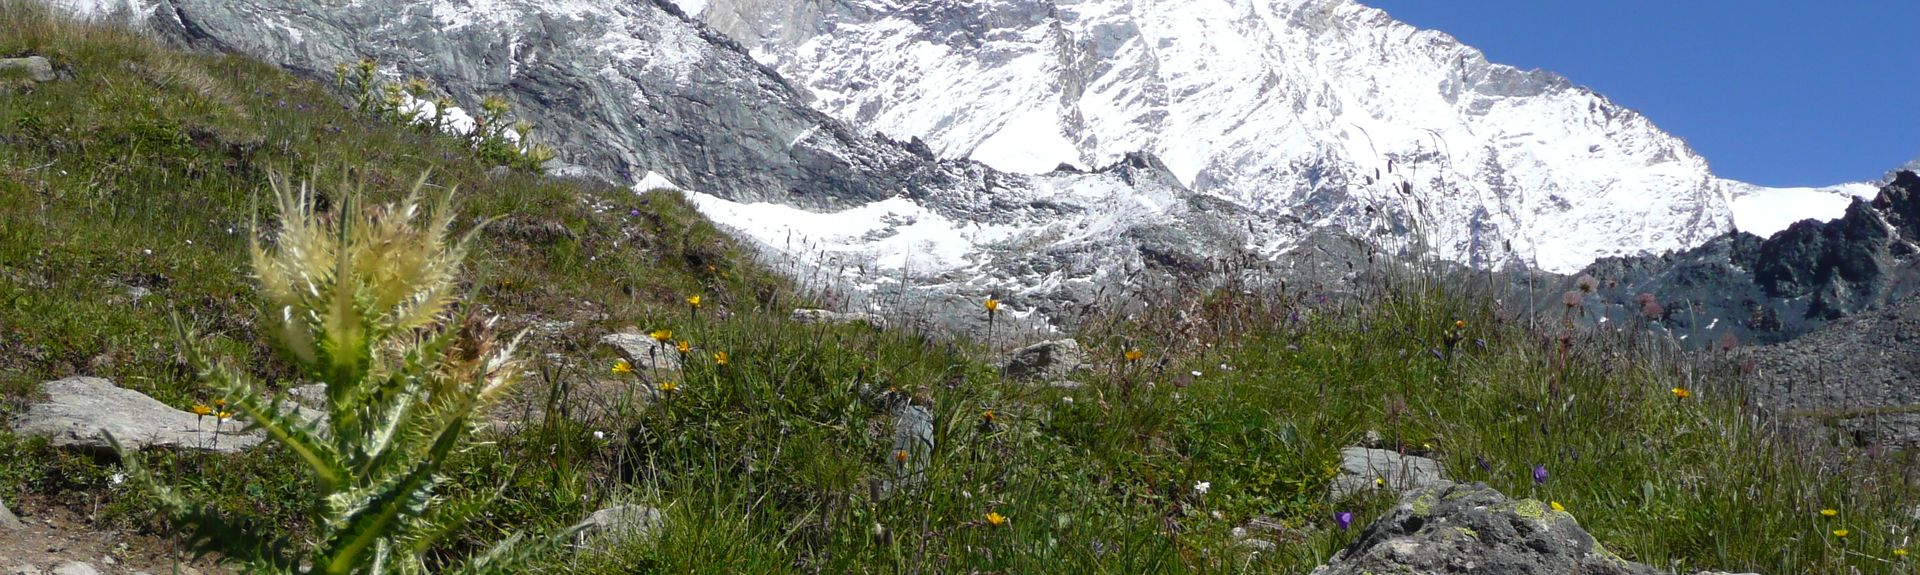 Vercorin, Chalais, Valais, Switzerland